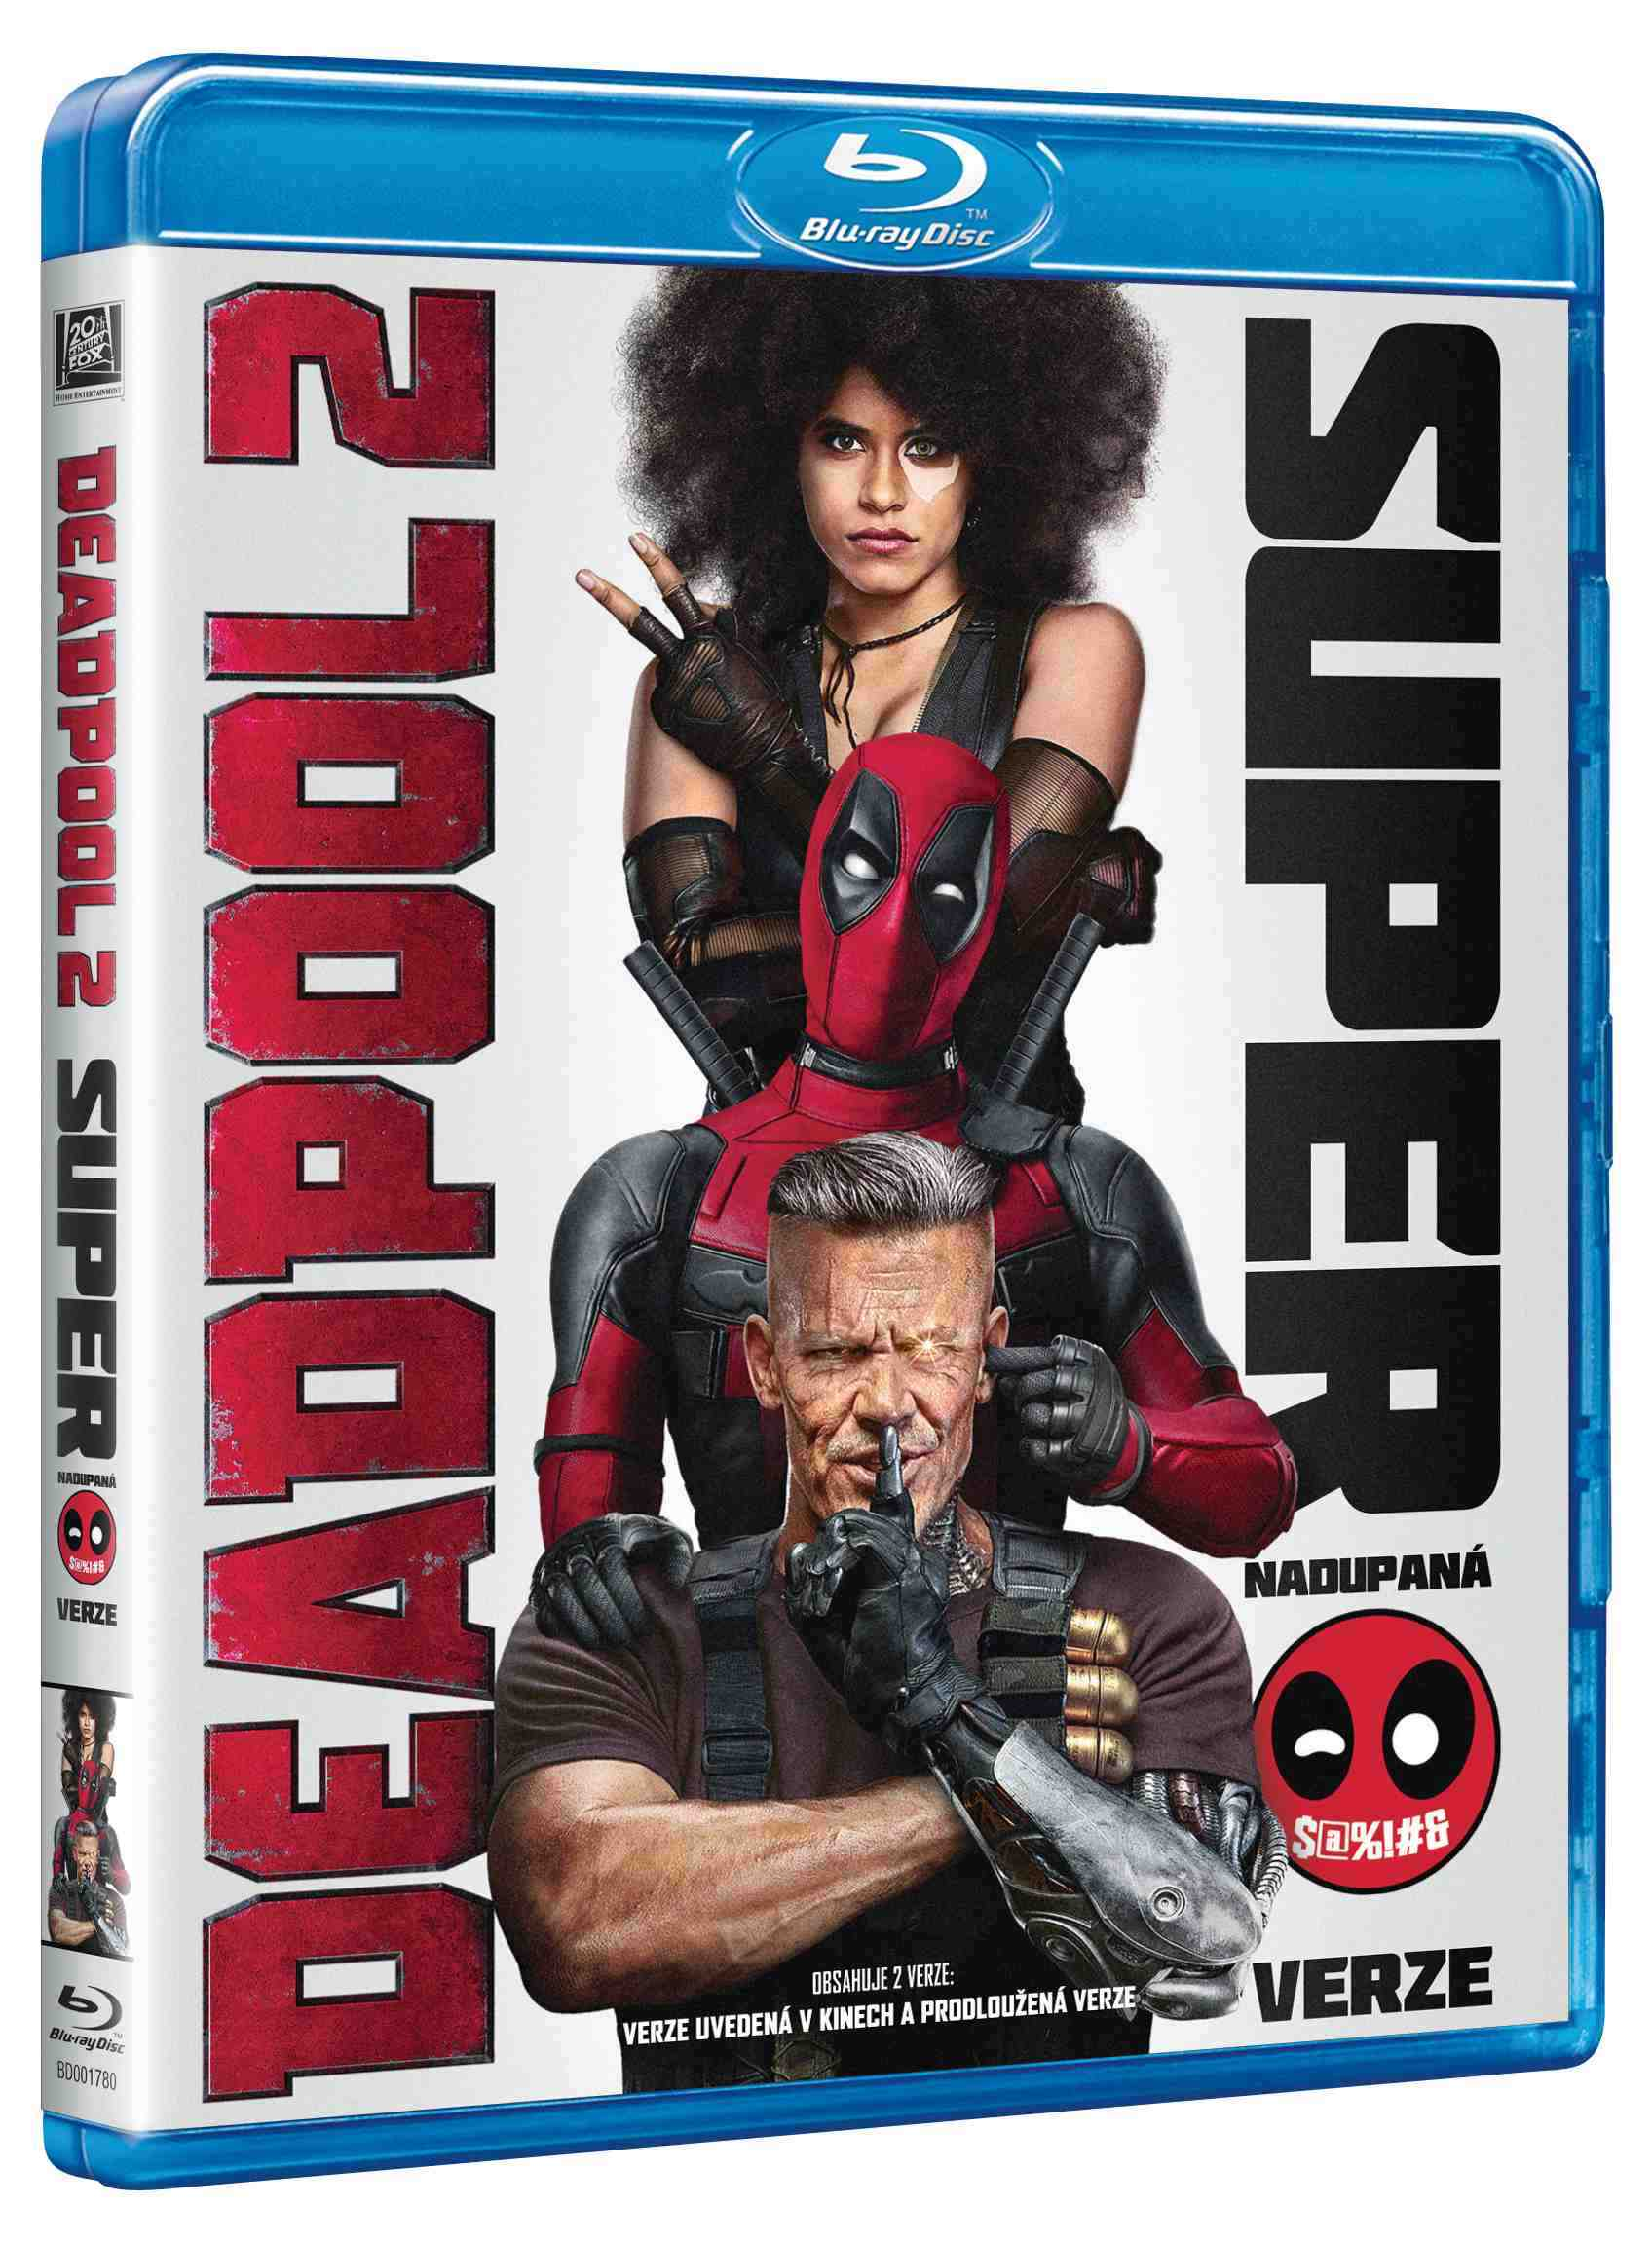 Deadpool 2 - Blu-ray (Super nadupaná verze 2BD)